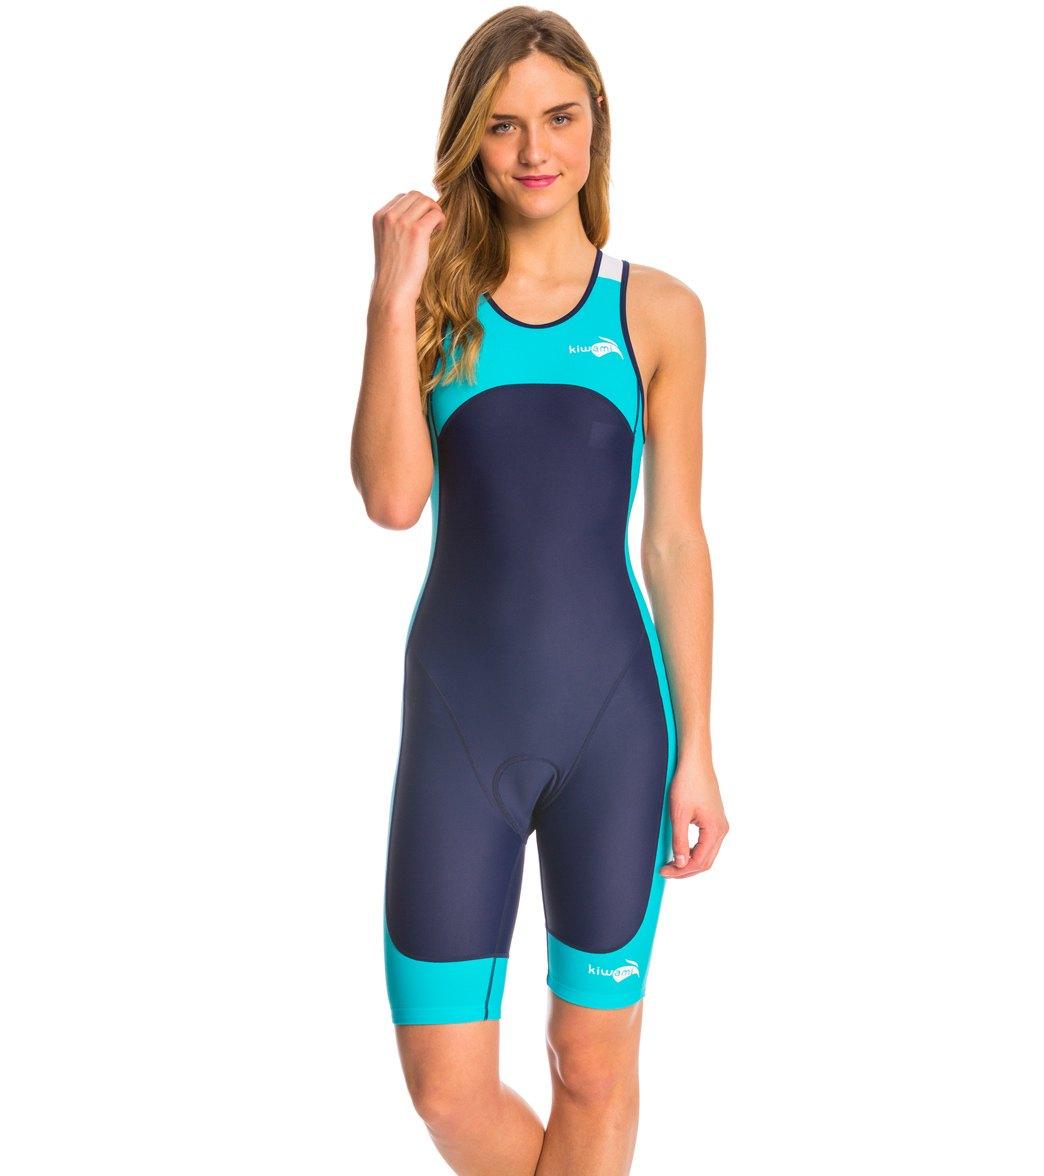 96f69dd27c5 Kiwami Women s Prima Openback Trisuit at SwimOutlet.com - Free Shipping